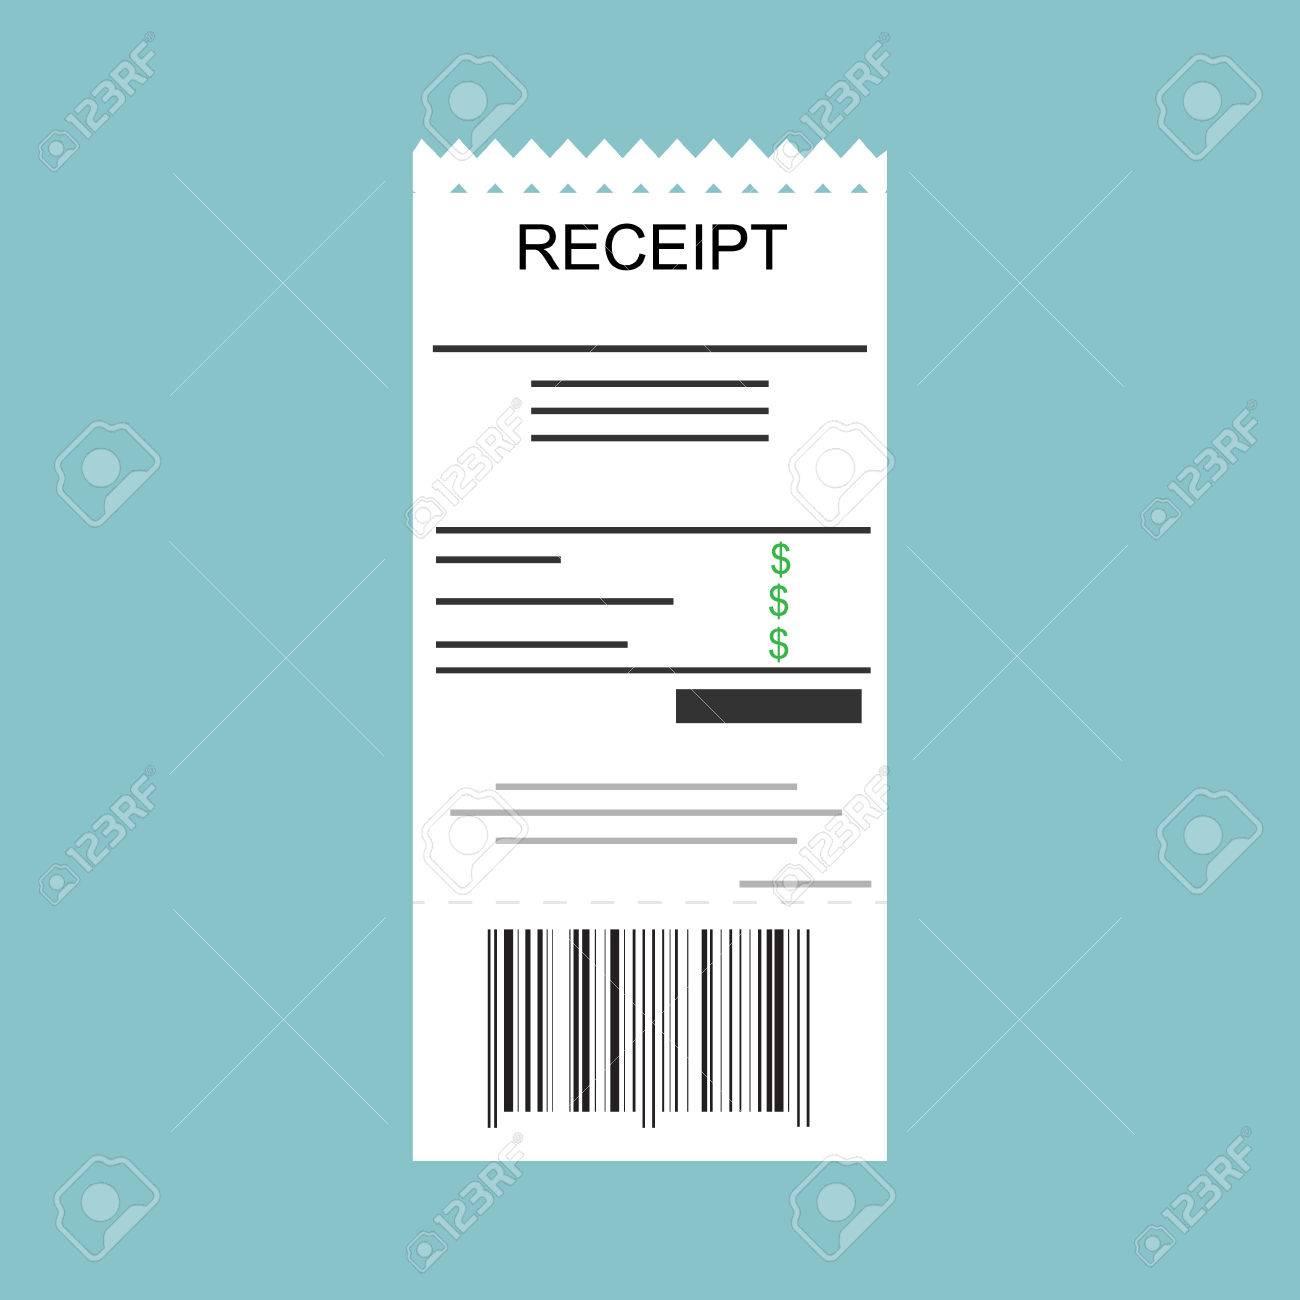 Receipt Icon Vector Illustration Paying Bills Concept Payment – Money Receipt Design